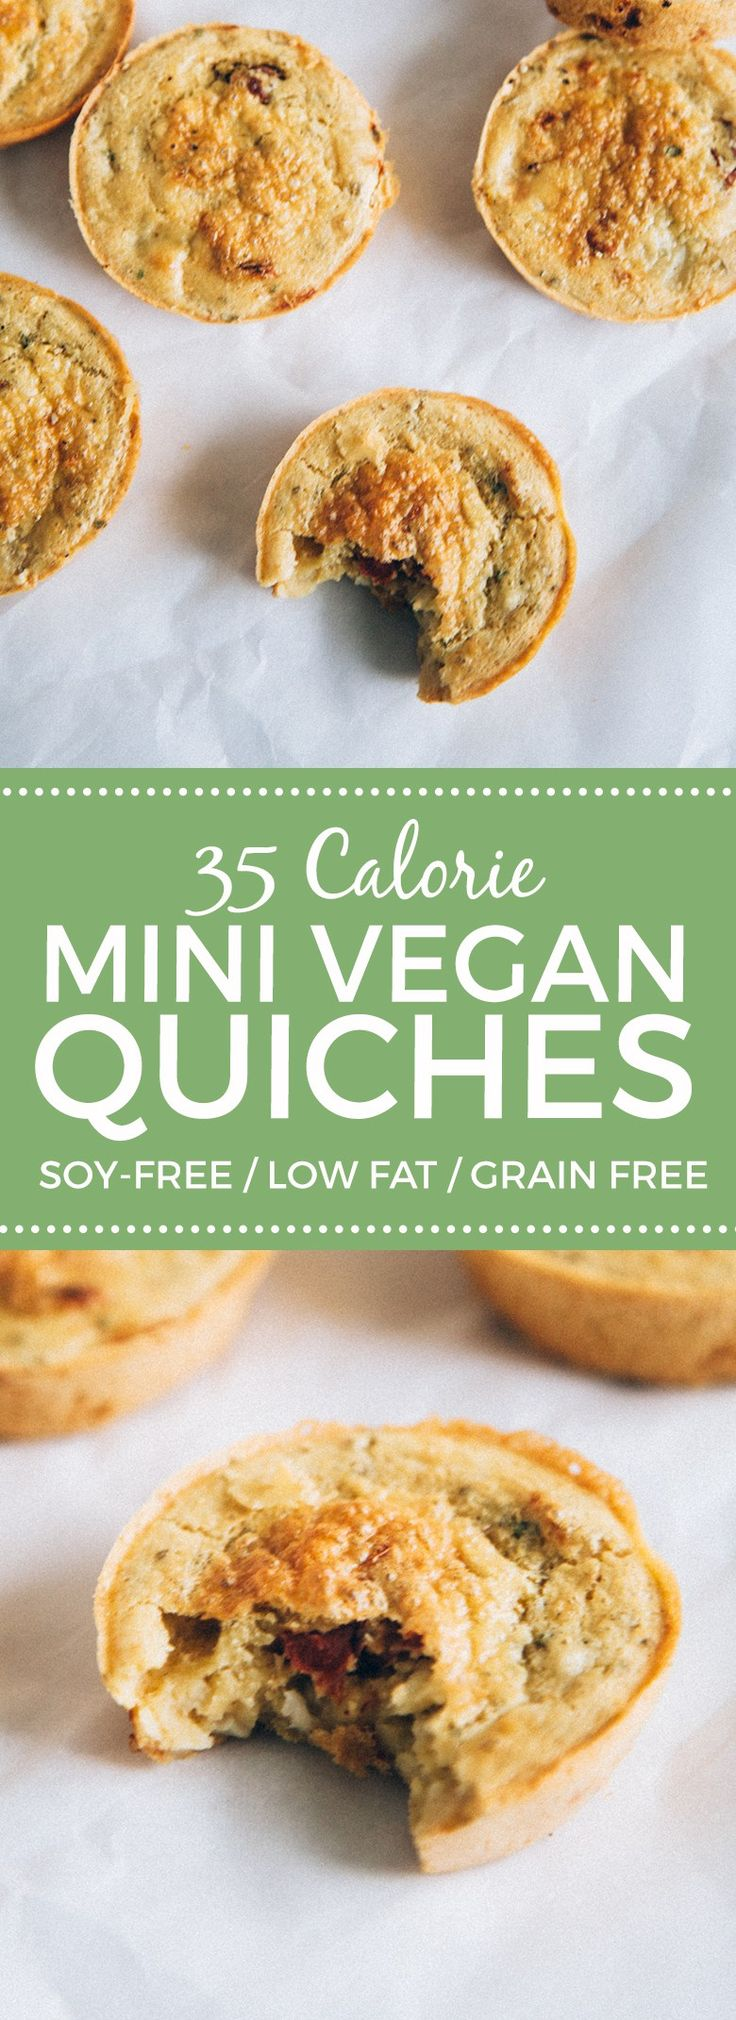 35-Calorie Mini Vegan Quiches #glutenfree #grainfree #soyfree